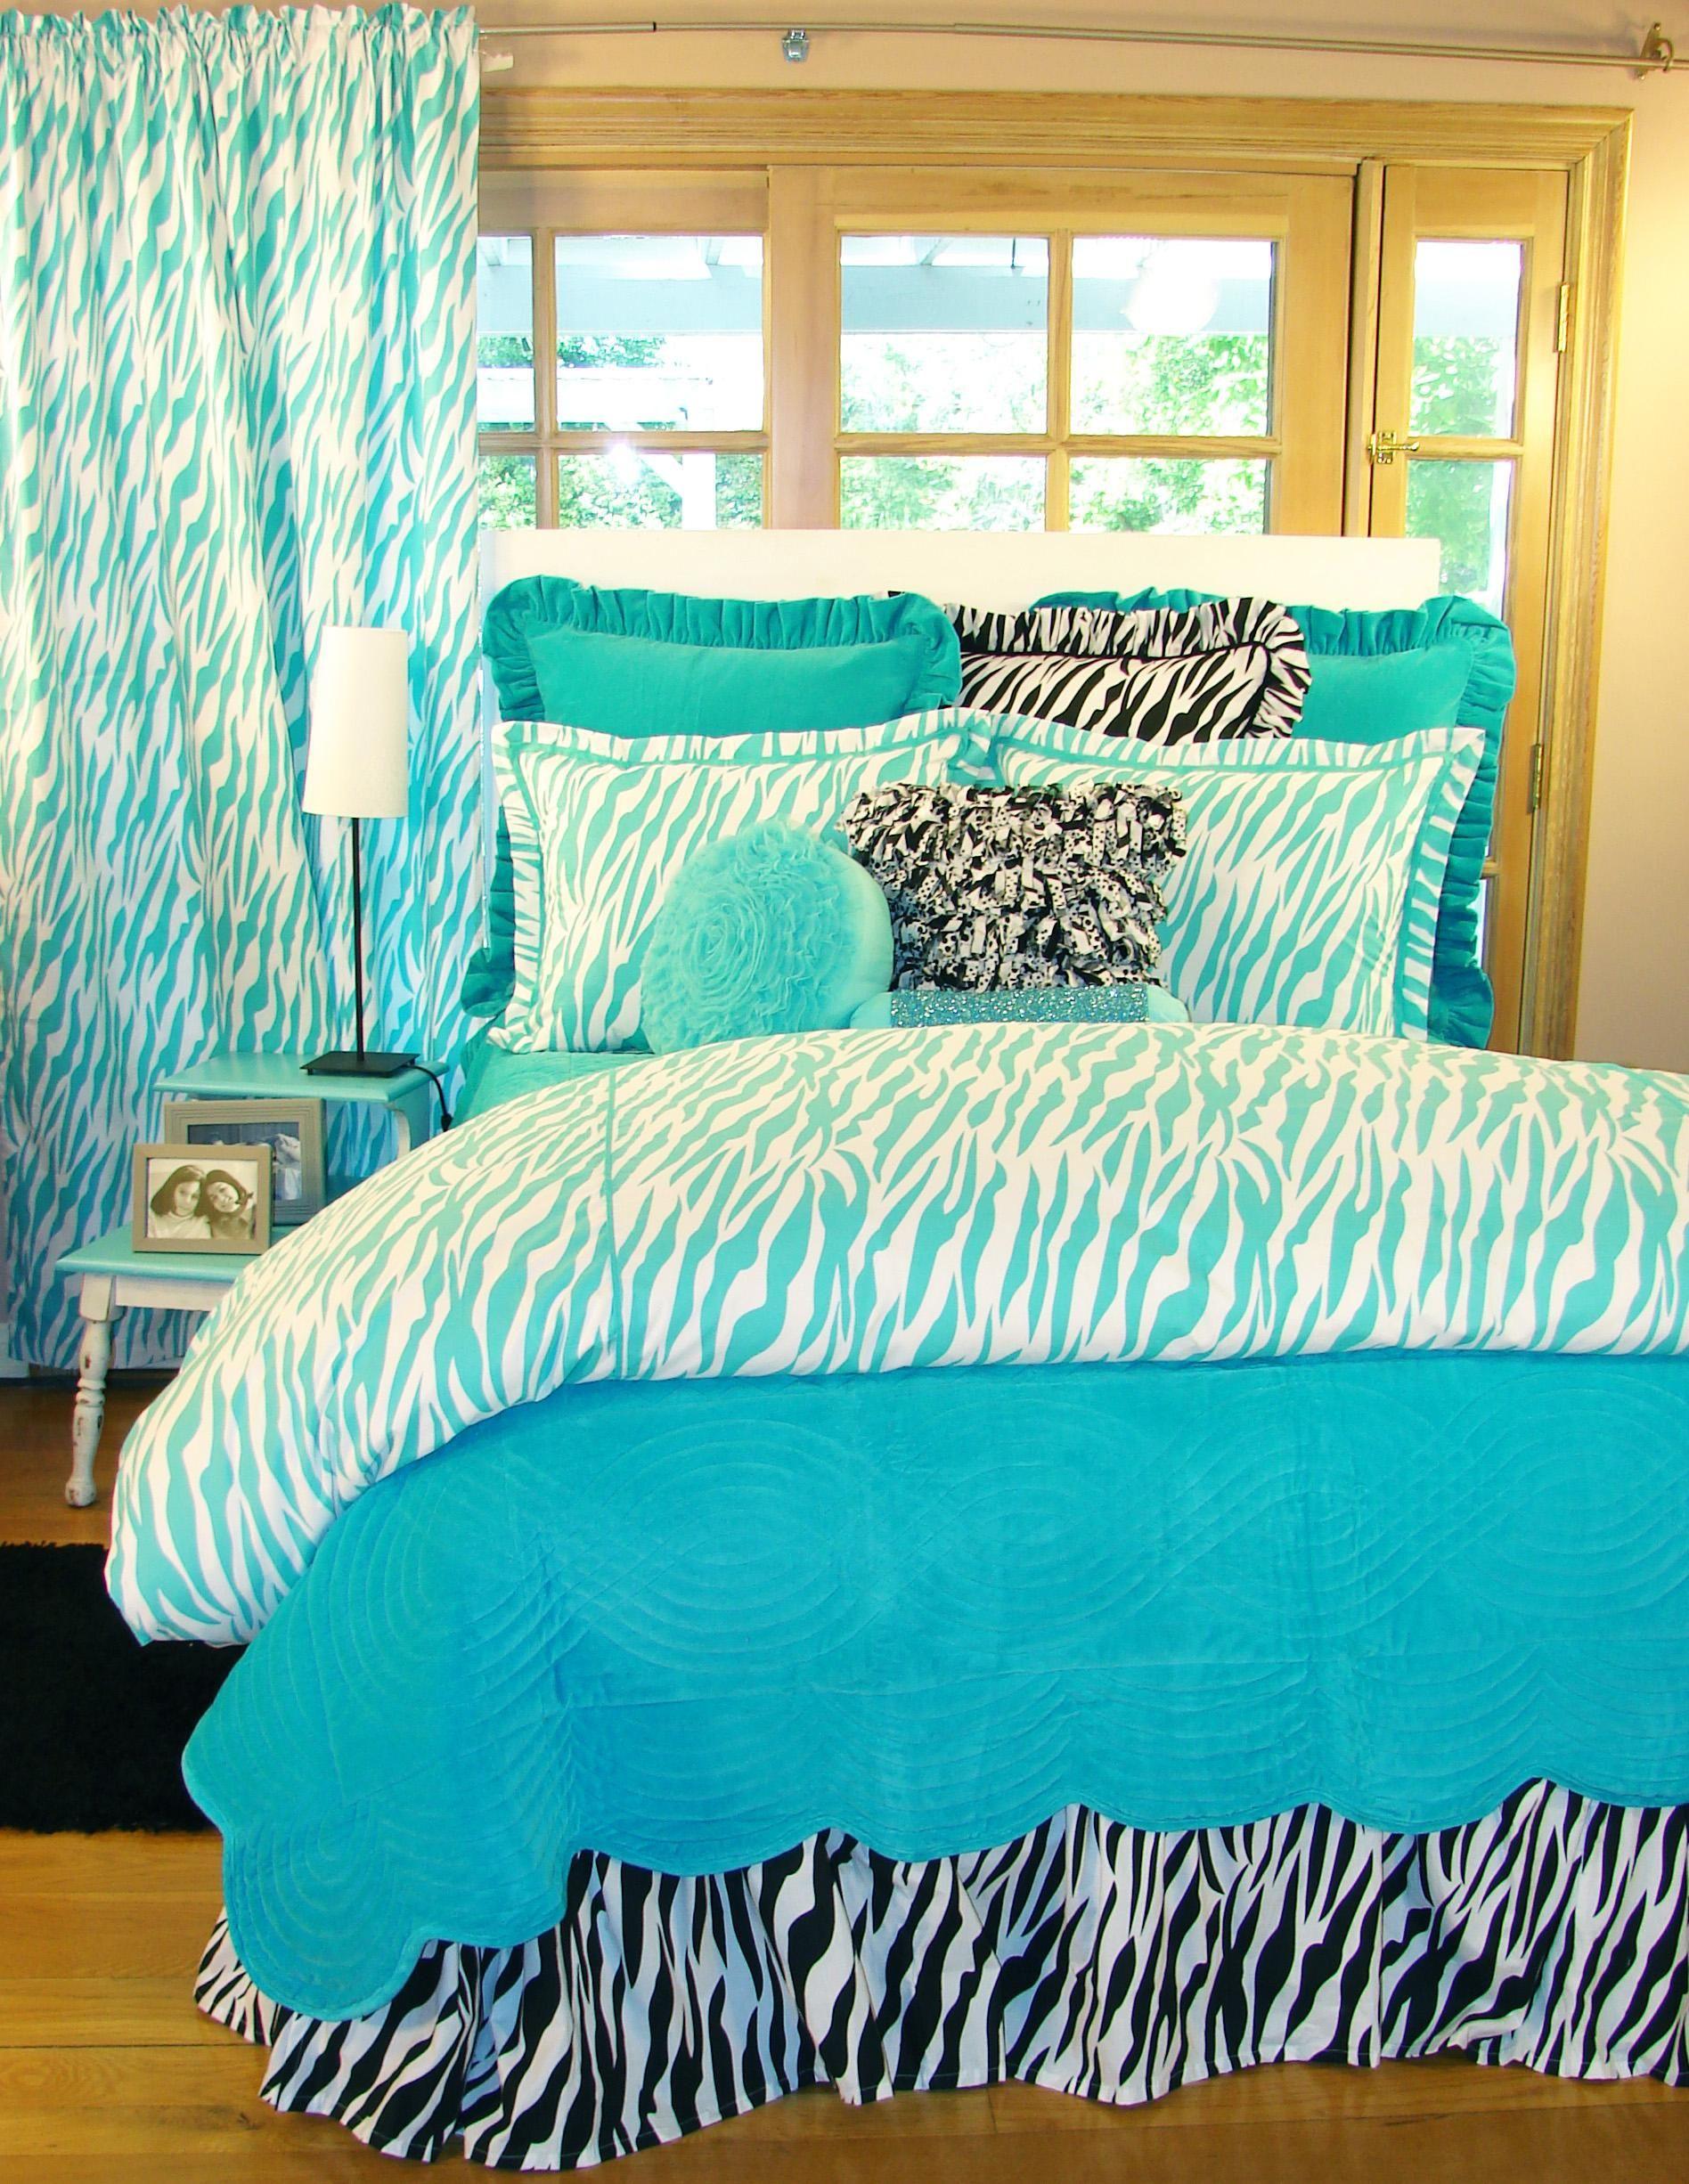 Teal Or Aqua Zebra Bedding Zebra Bedding Bedroom Decor